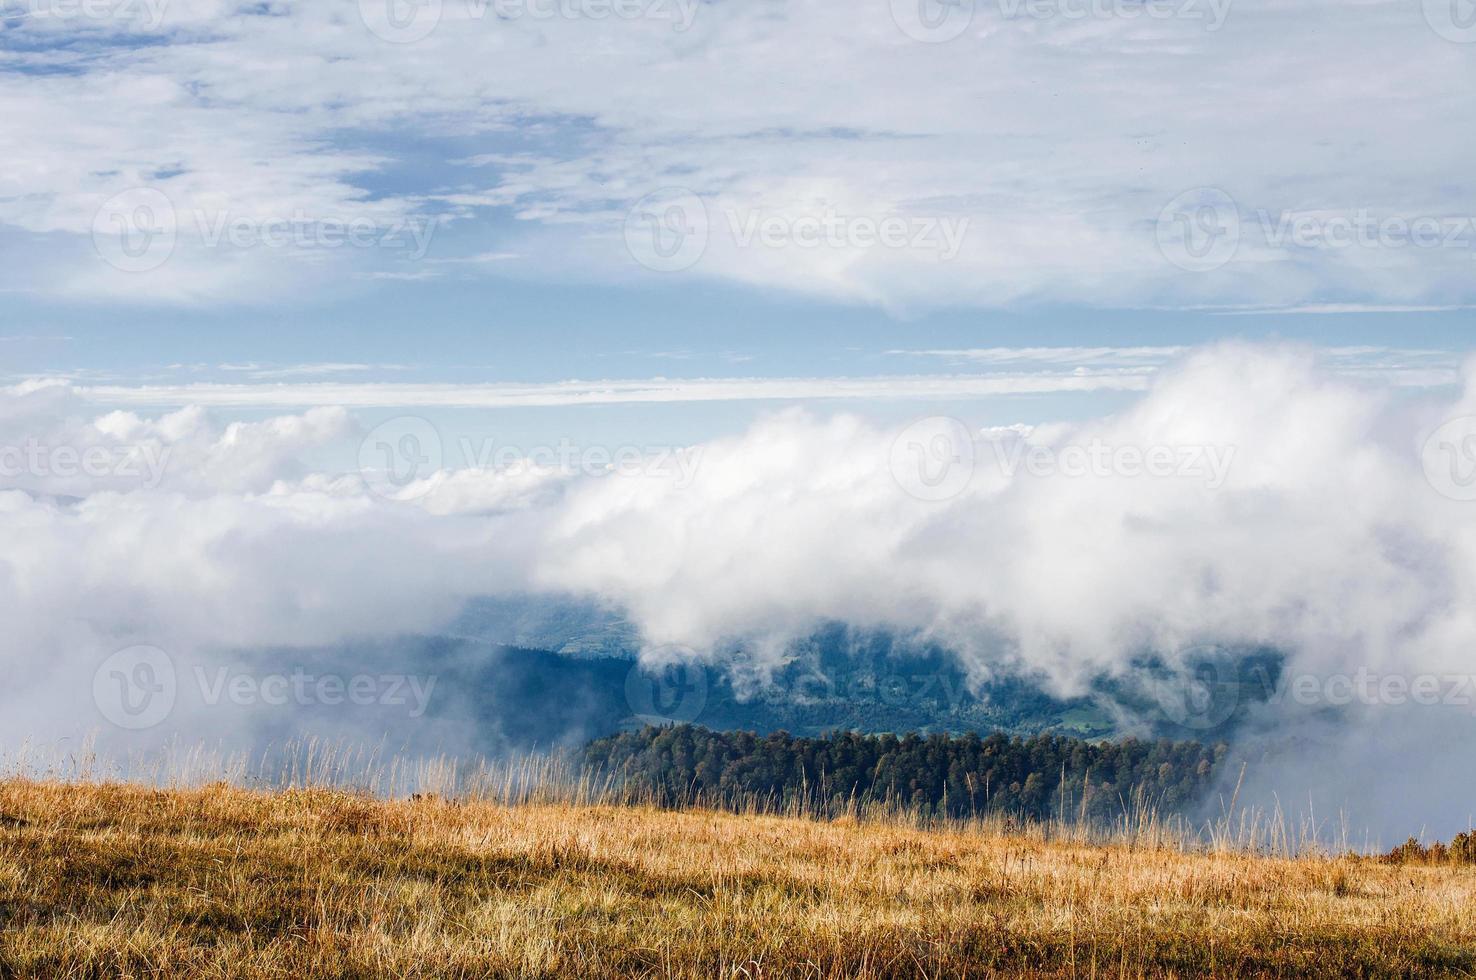 montagne tra le nuvole foto